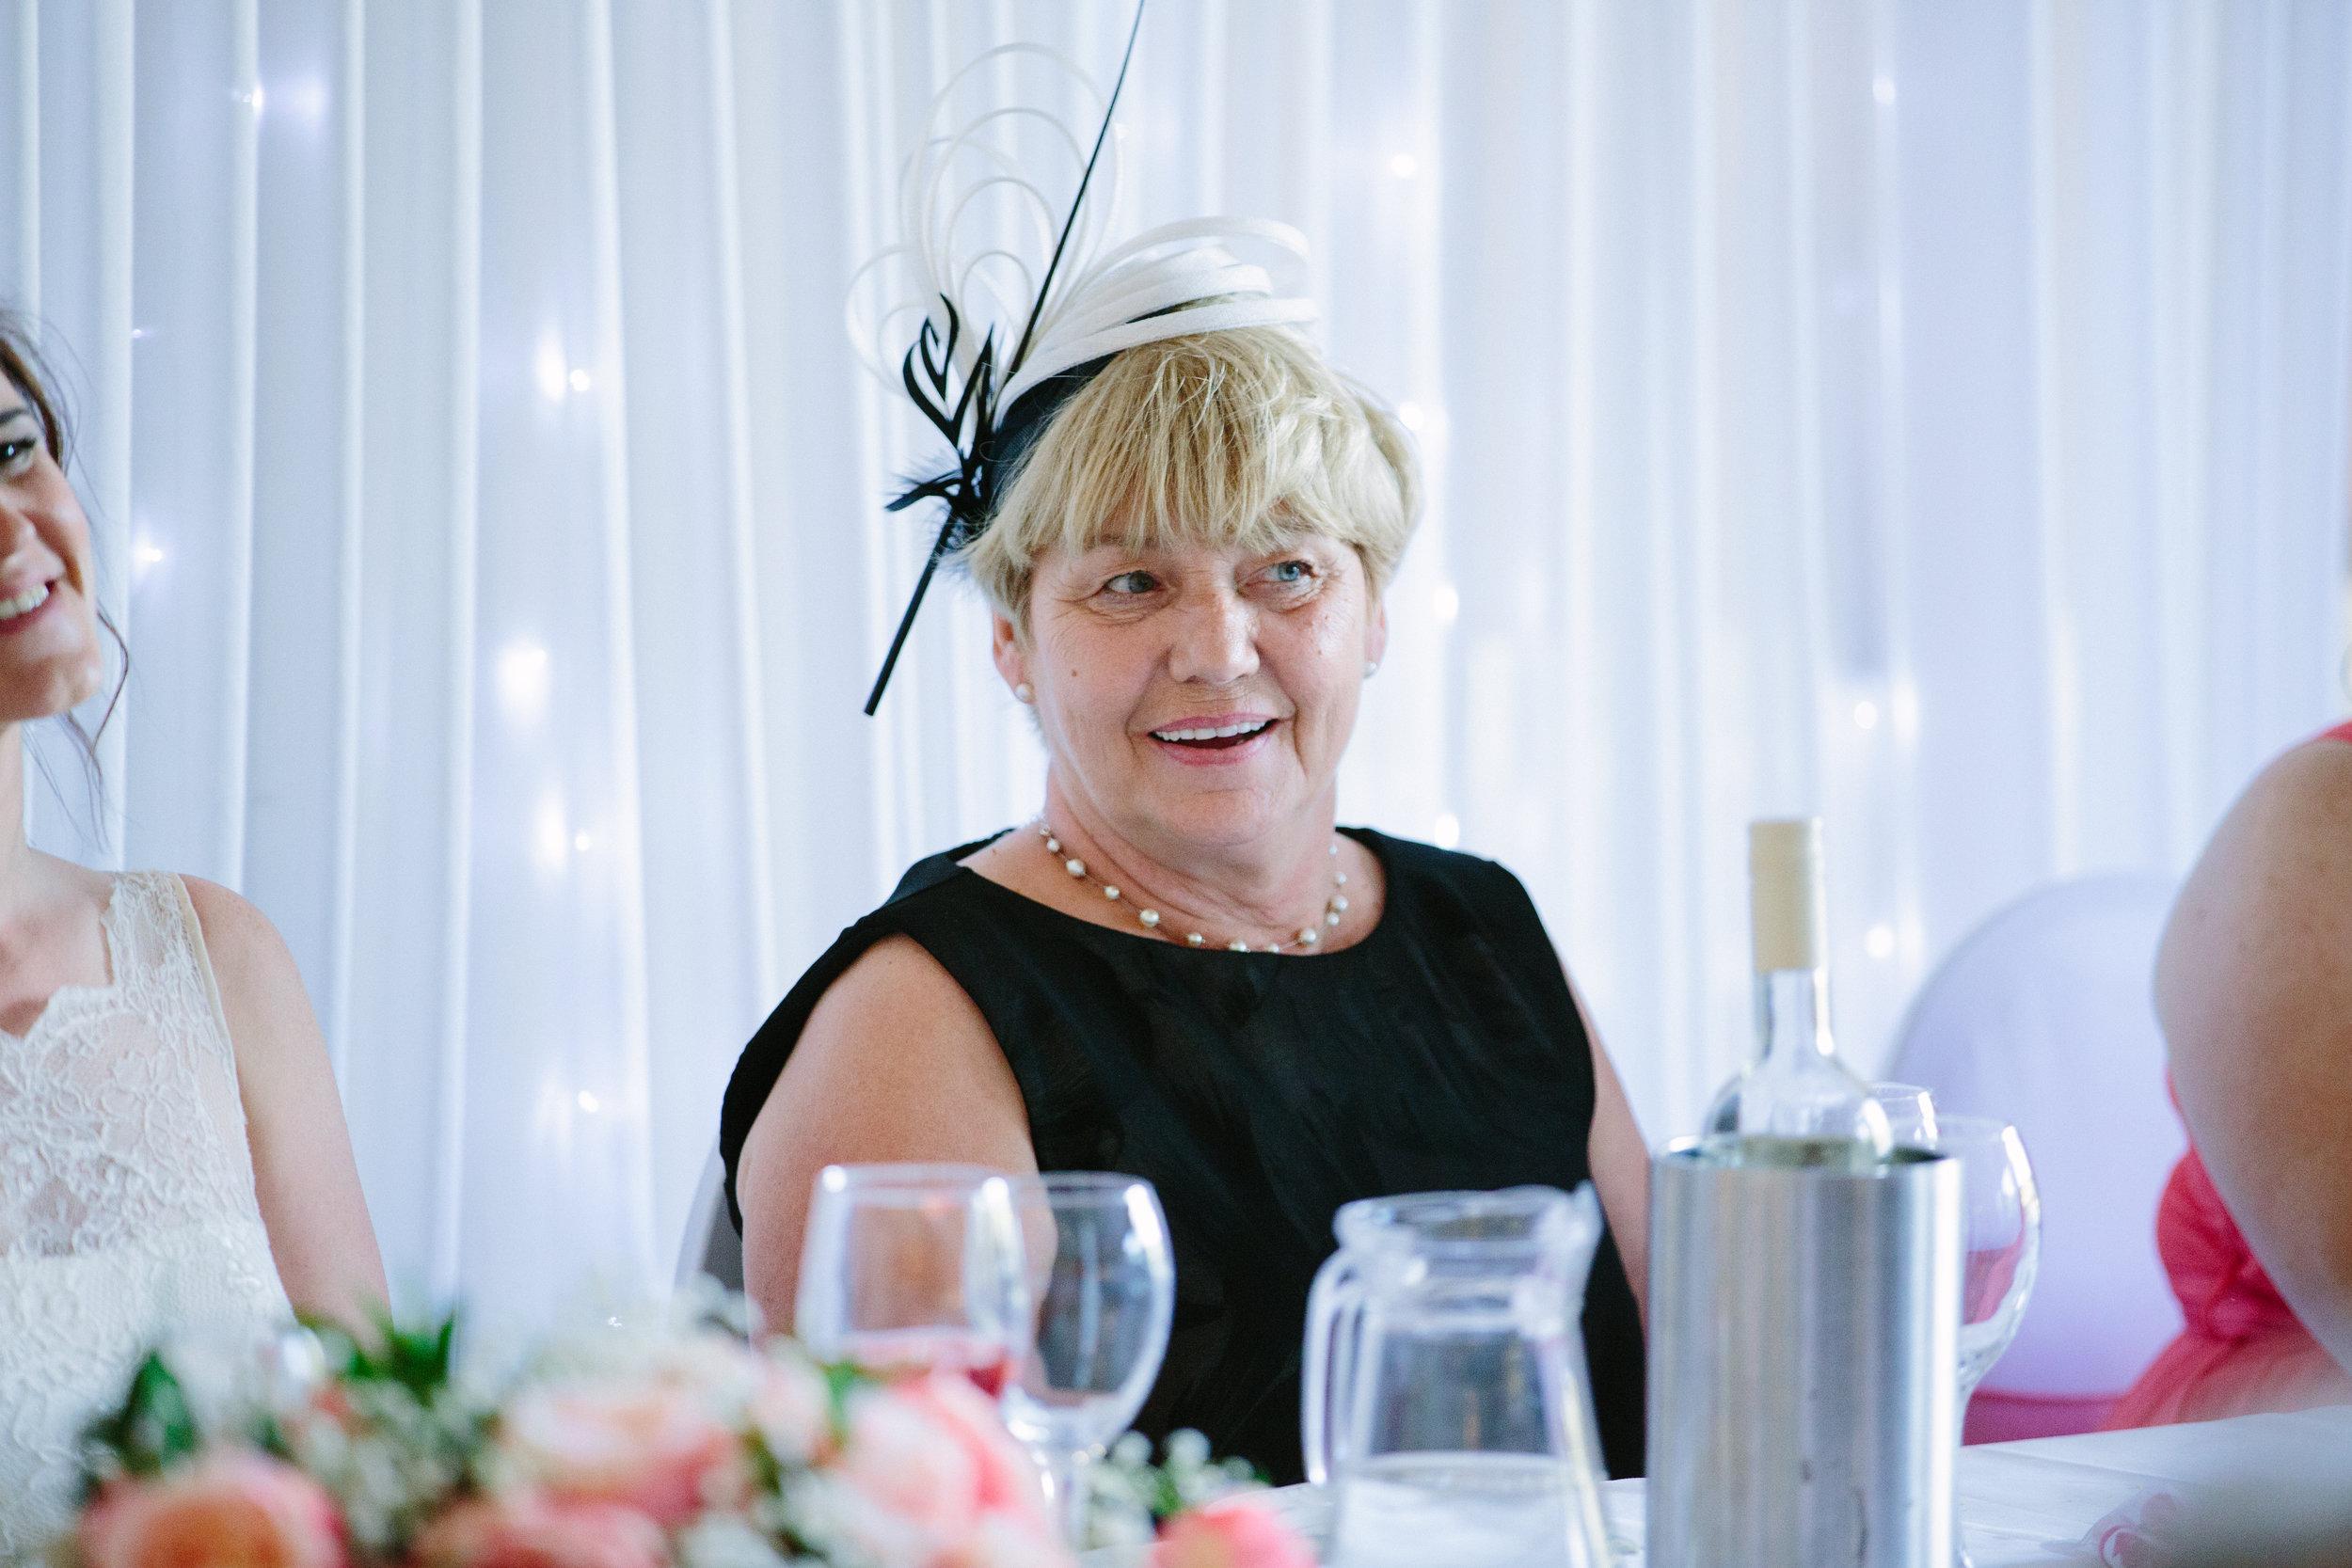 reigate-surrey-london-wedding-photography-group-formal-shot-reception-woldingham-golf-club-85